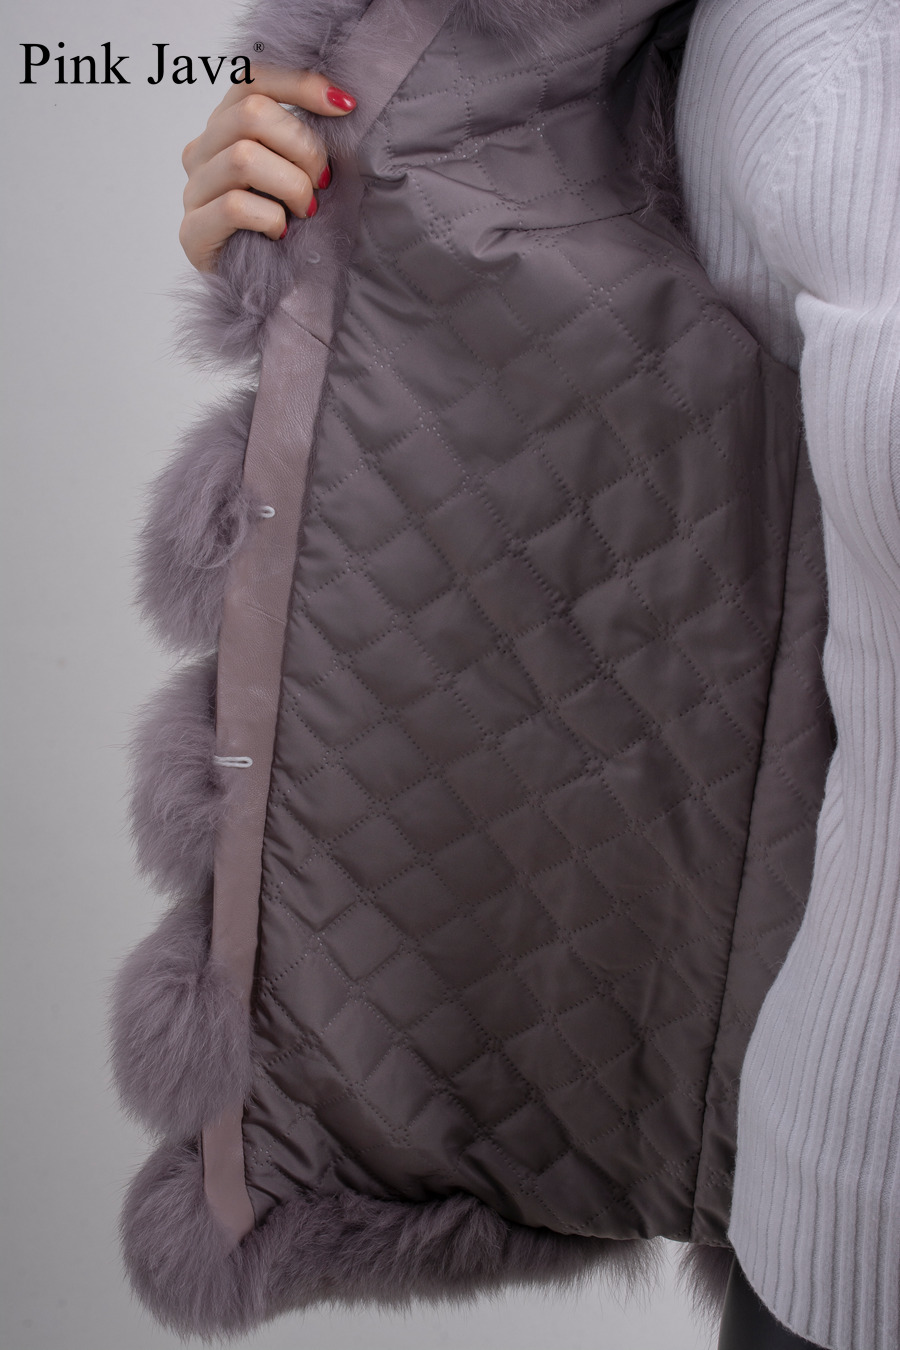 Image 5 - pink java QC8049   2016  New women real  fox fur vest high quality fur gilet hot sale fashion thick fur coat  FREE SHIPPINGgilet clothinggilets mengilet vest -